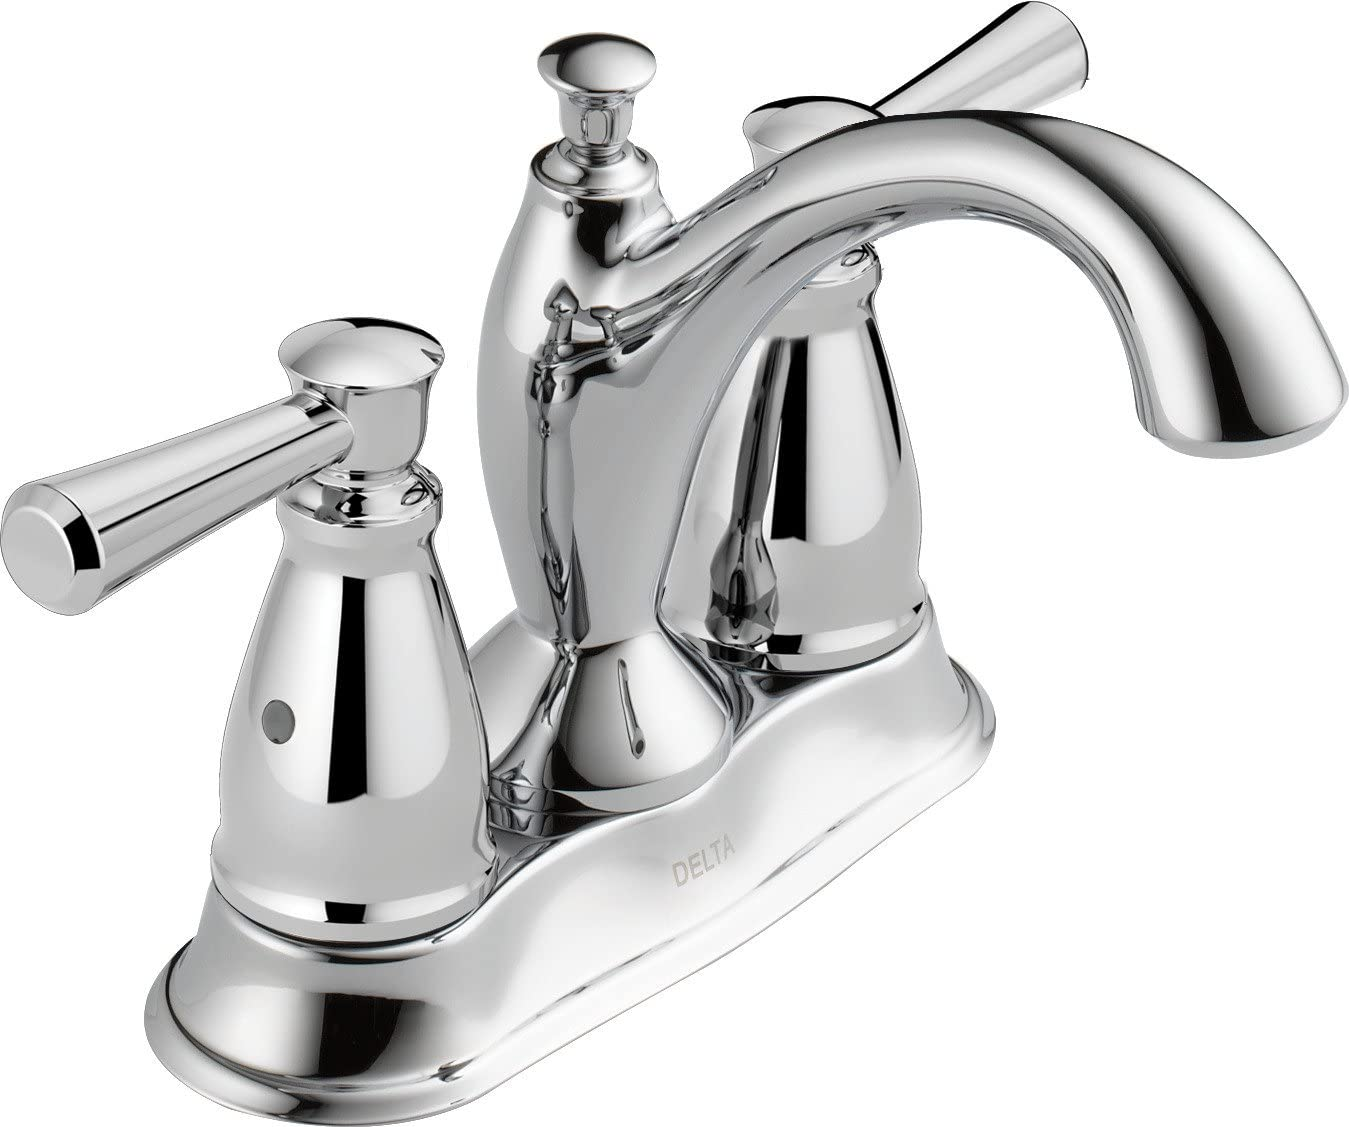 Delta Faucet Linden Centerset Bathroom Faucet Chrome, Bathroom Sink Faucet, Diamond Seal Technology, Metal Drain Assembly, Chrome 2593-MPU-DST